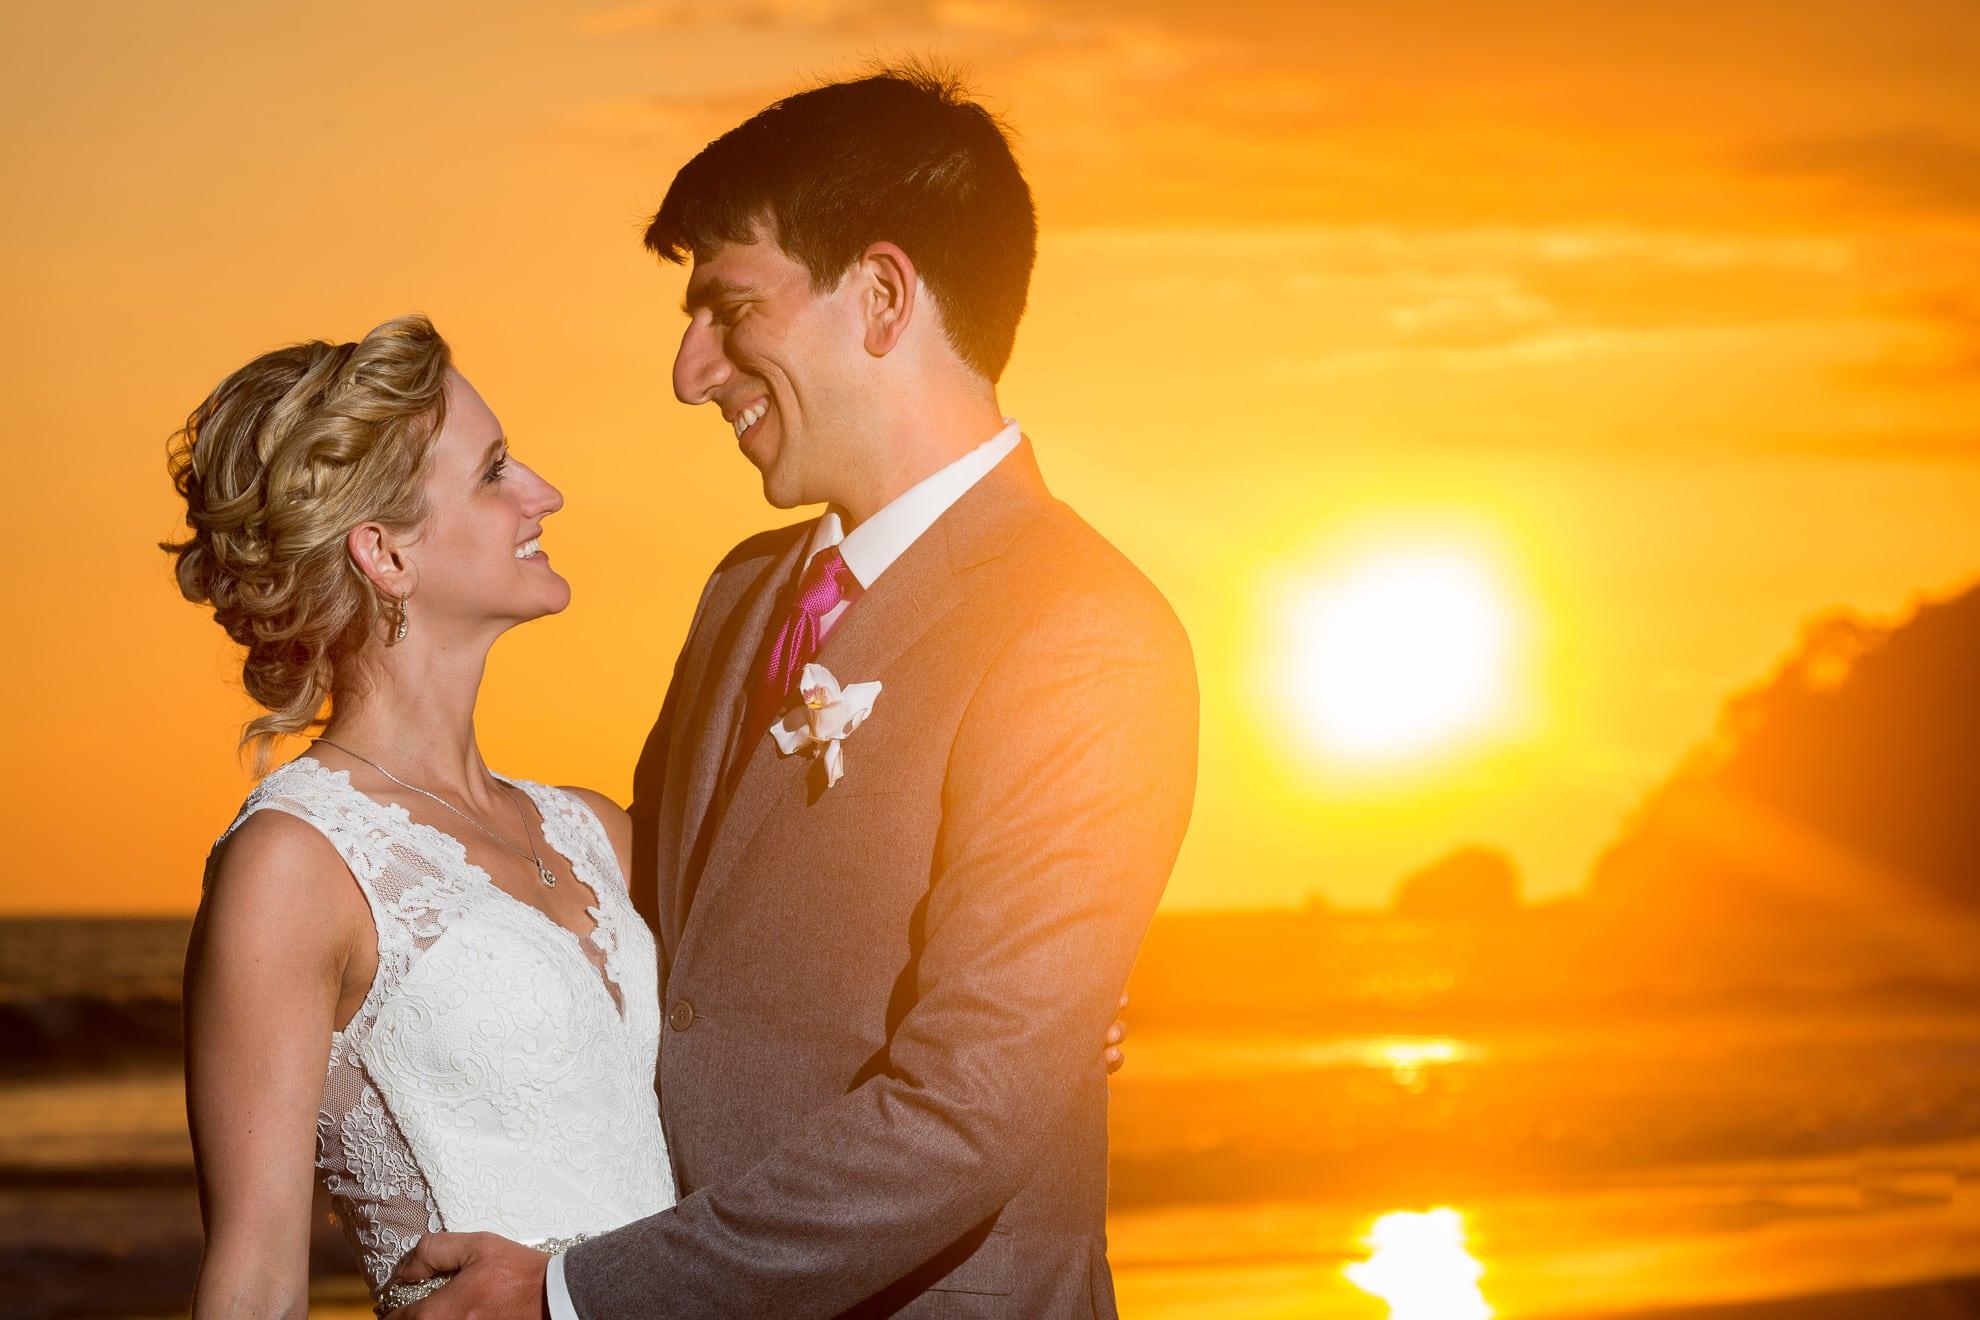 sunset at destination wedding in manuel antonio beach